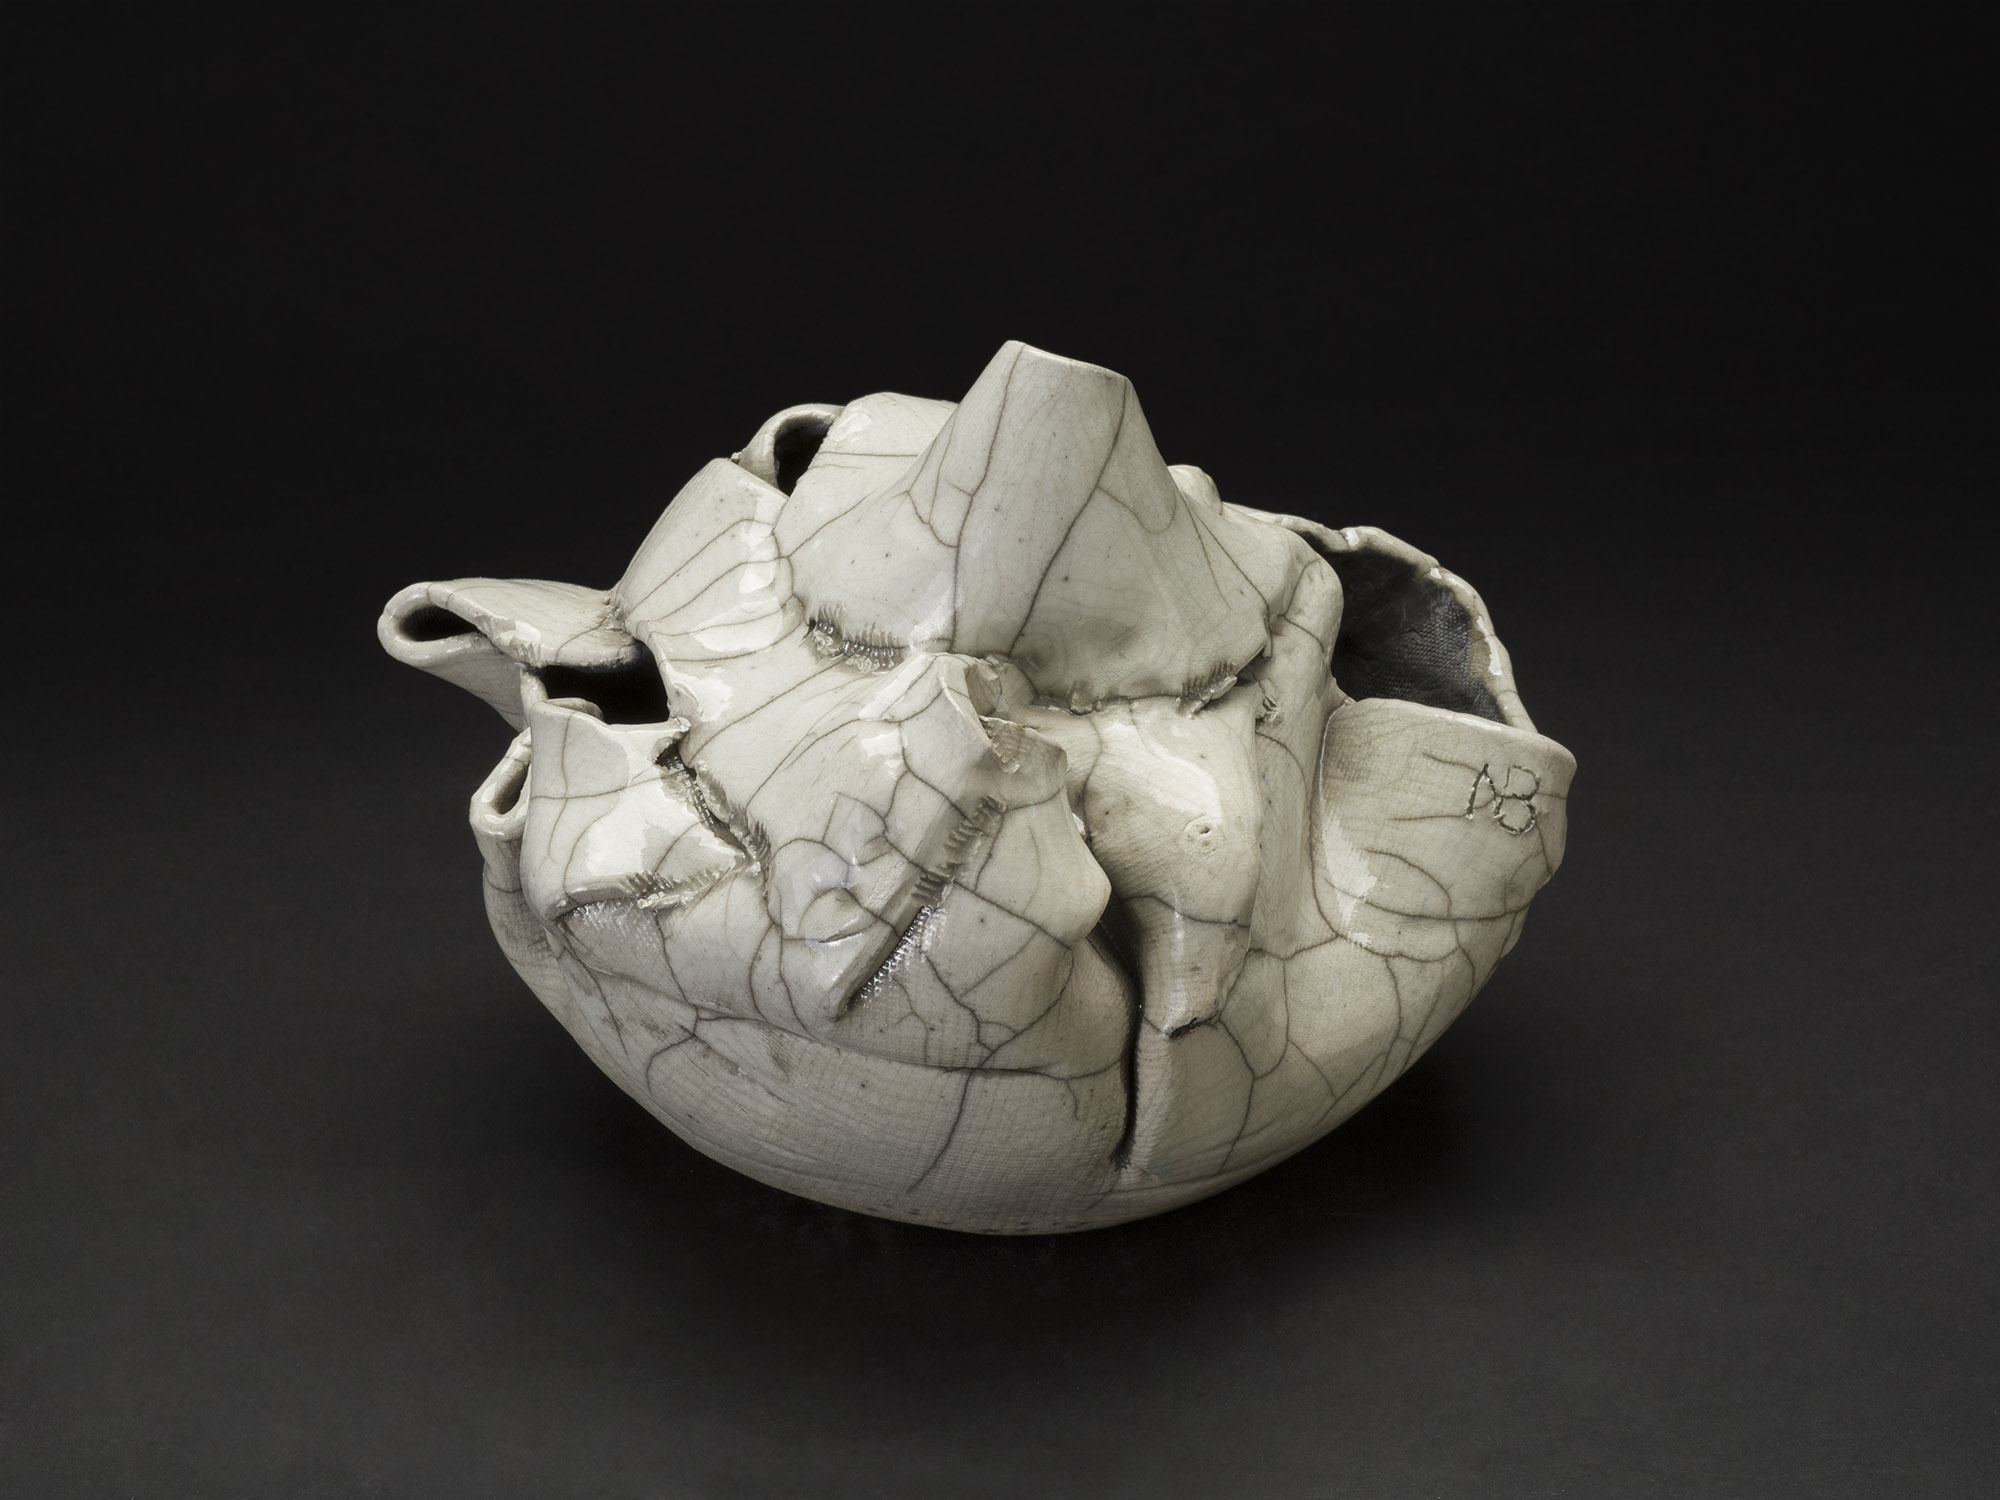 Nancy Brorby    Untitled  , c. 1992-2004 Ceramic 9 x 10 x 8 inches 22.9 x 25.4 x 20.3 cm NBr 9